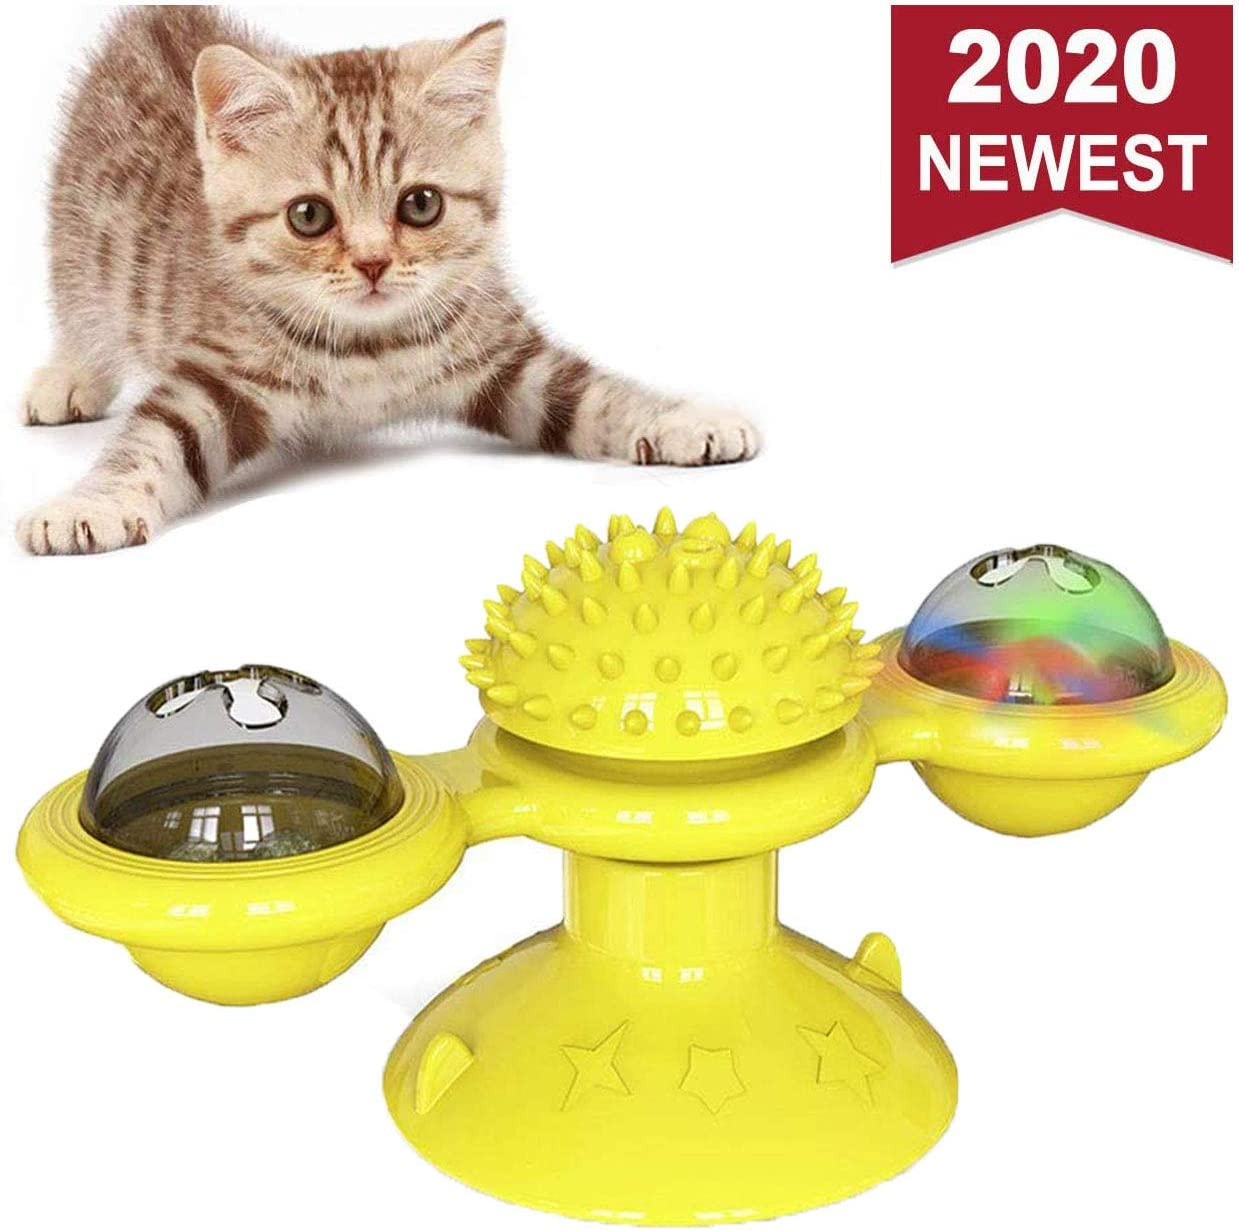 WELLXUNK Windmill Cat Toy, Juguetes para Gatos, Cepillo de Pelo para Gatos rascadores y cosquillas, Juguete Interactivo de burlas giratorias para Gatos, Juguete rascador de cosquillas para Gatos: Amazon.es: Productos para mascotas